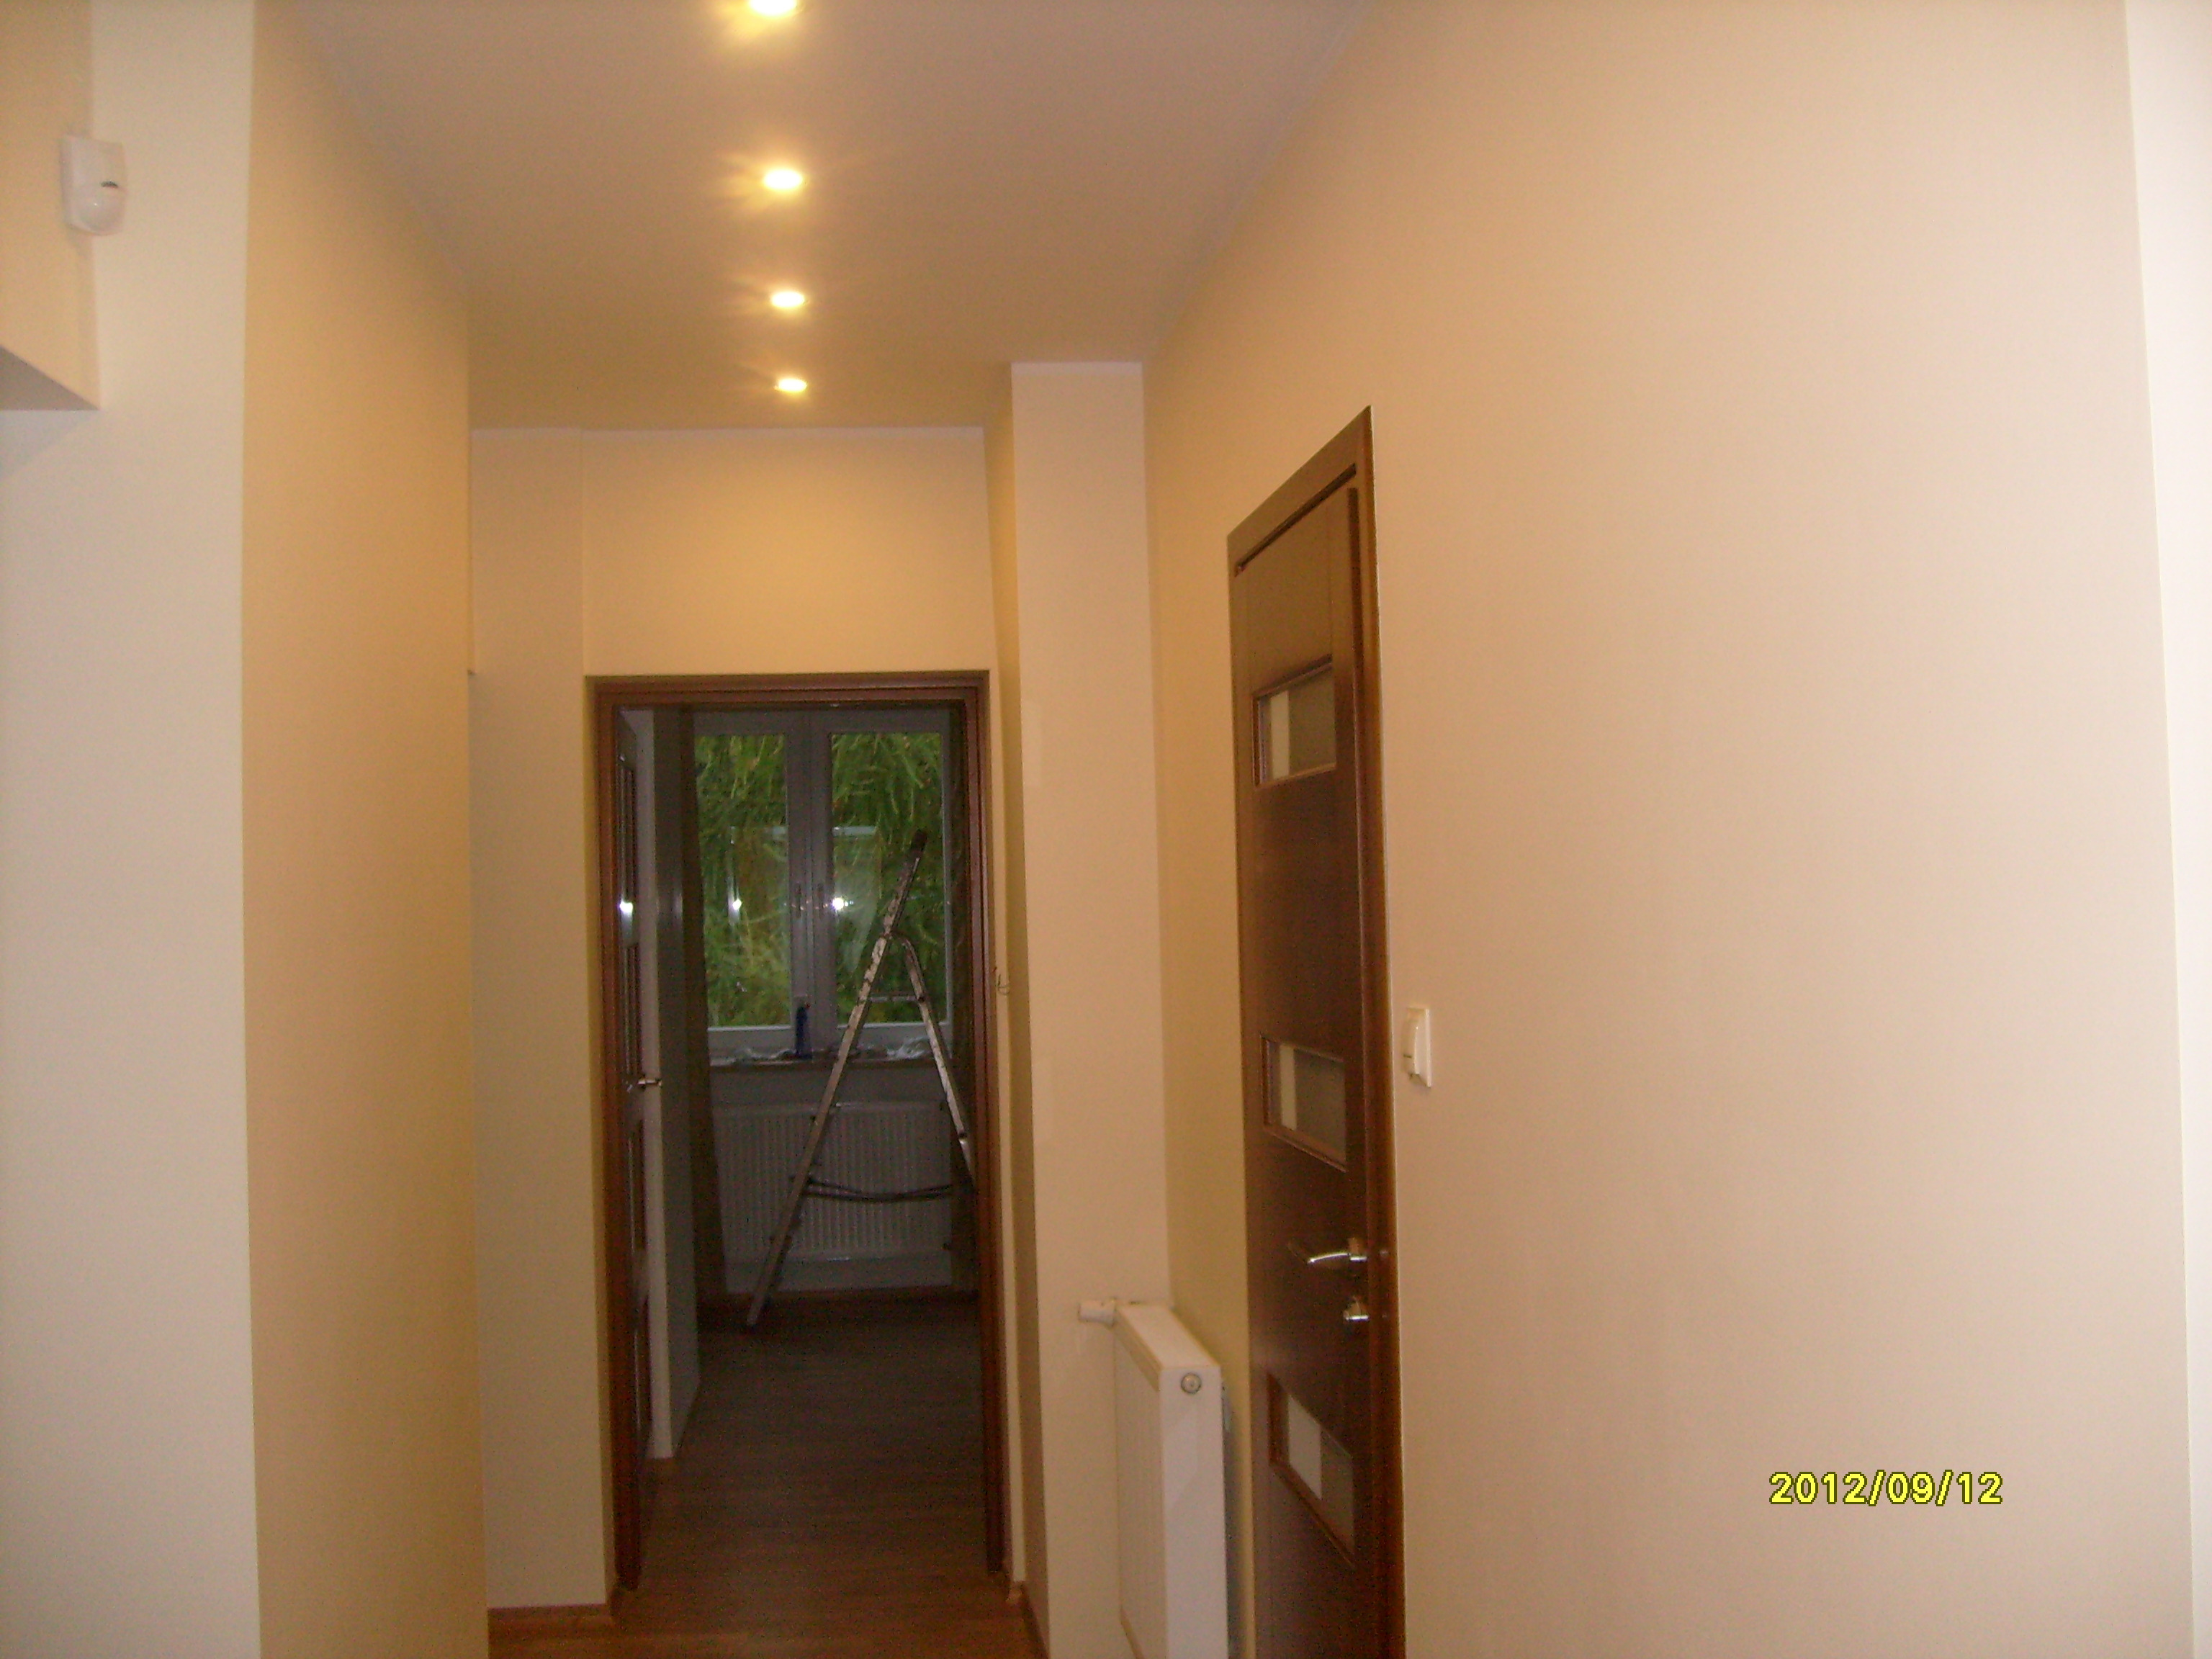 Mieszkanie 1 (1)